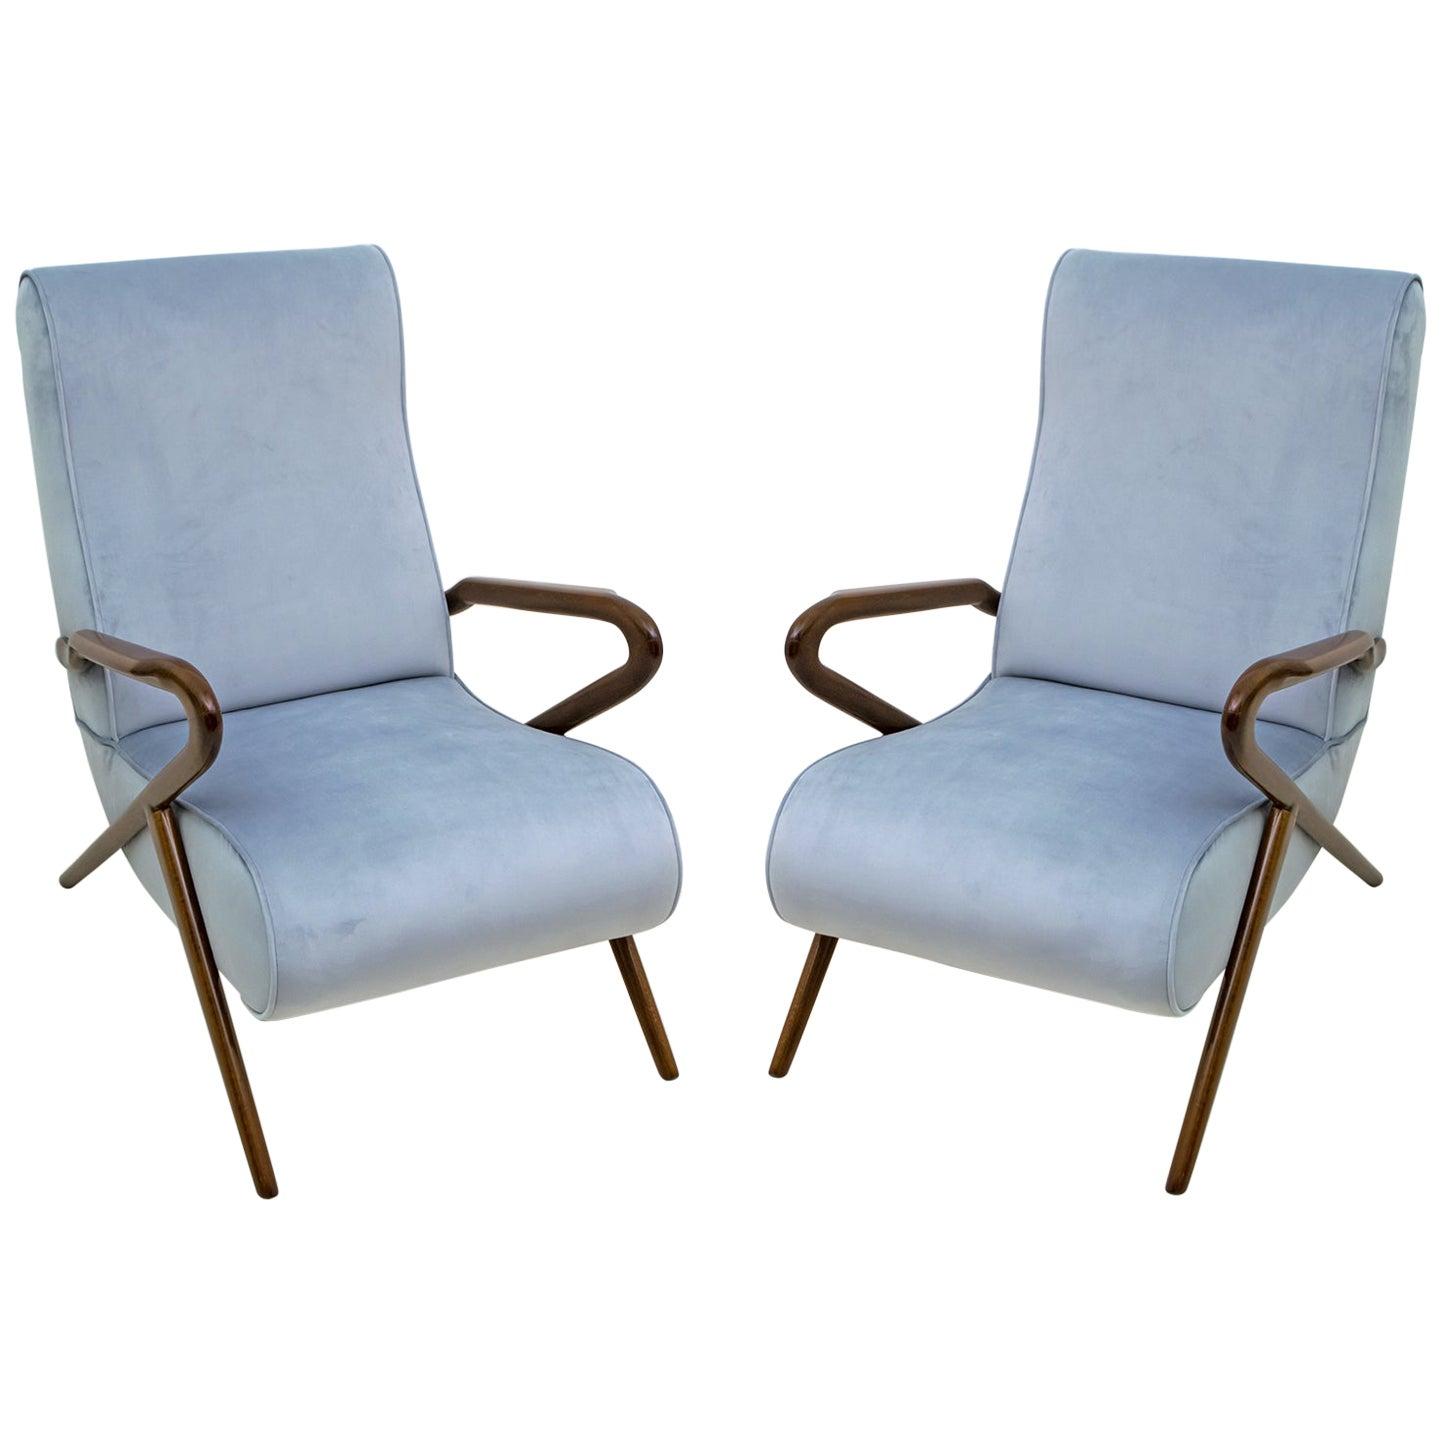 Pair of Carlo de Carli Mid-Century Modern Italian Velvet Armchairs, 1960s